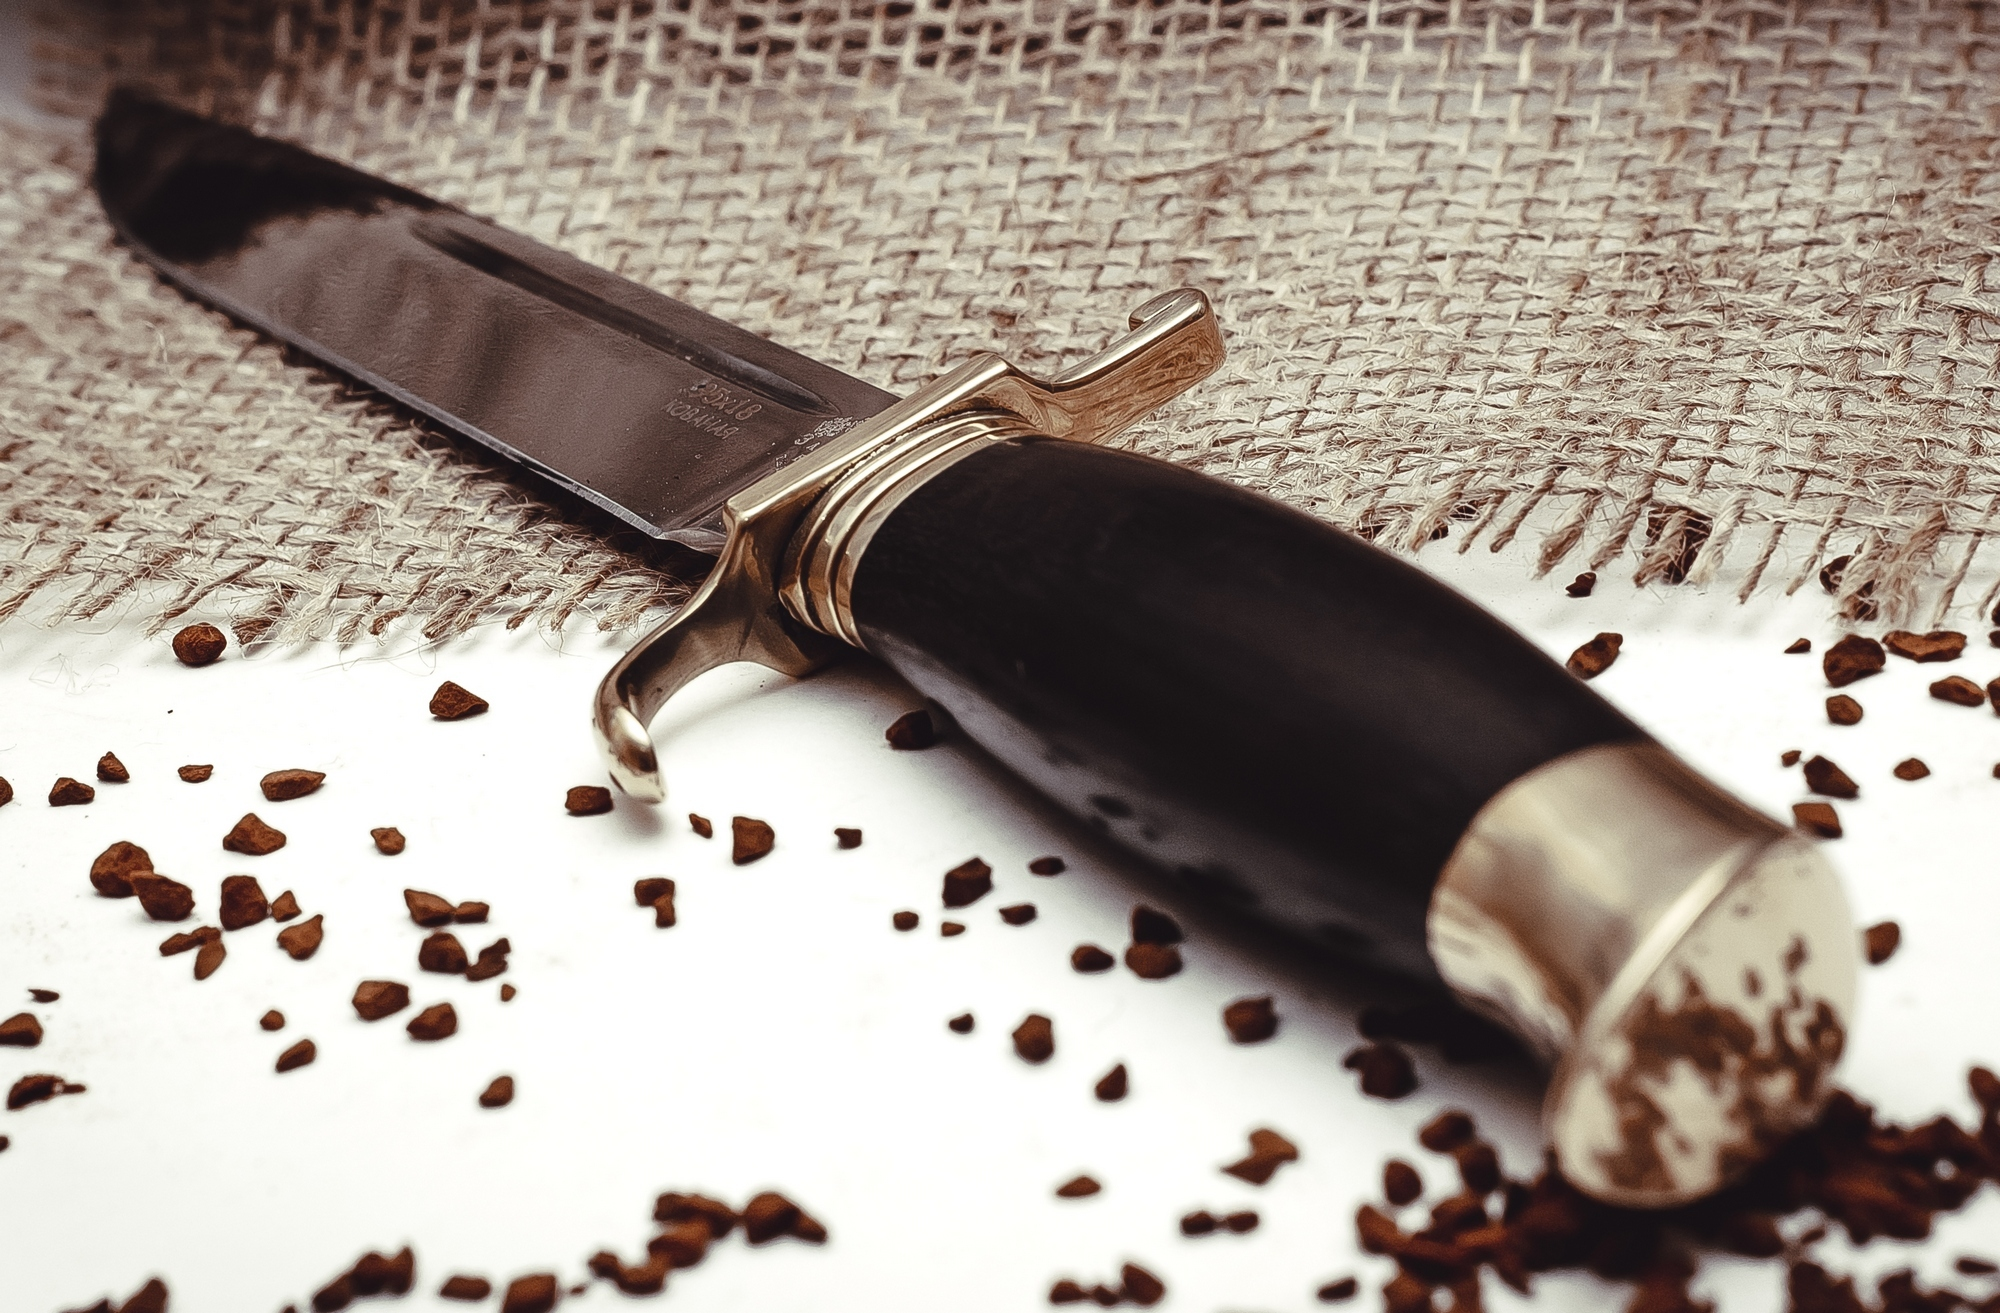 Фото 7 - Нож Финка НКВД, ков. 95х18, латунь от Кузница Завьялова